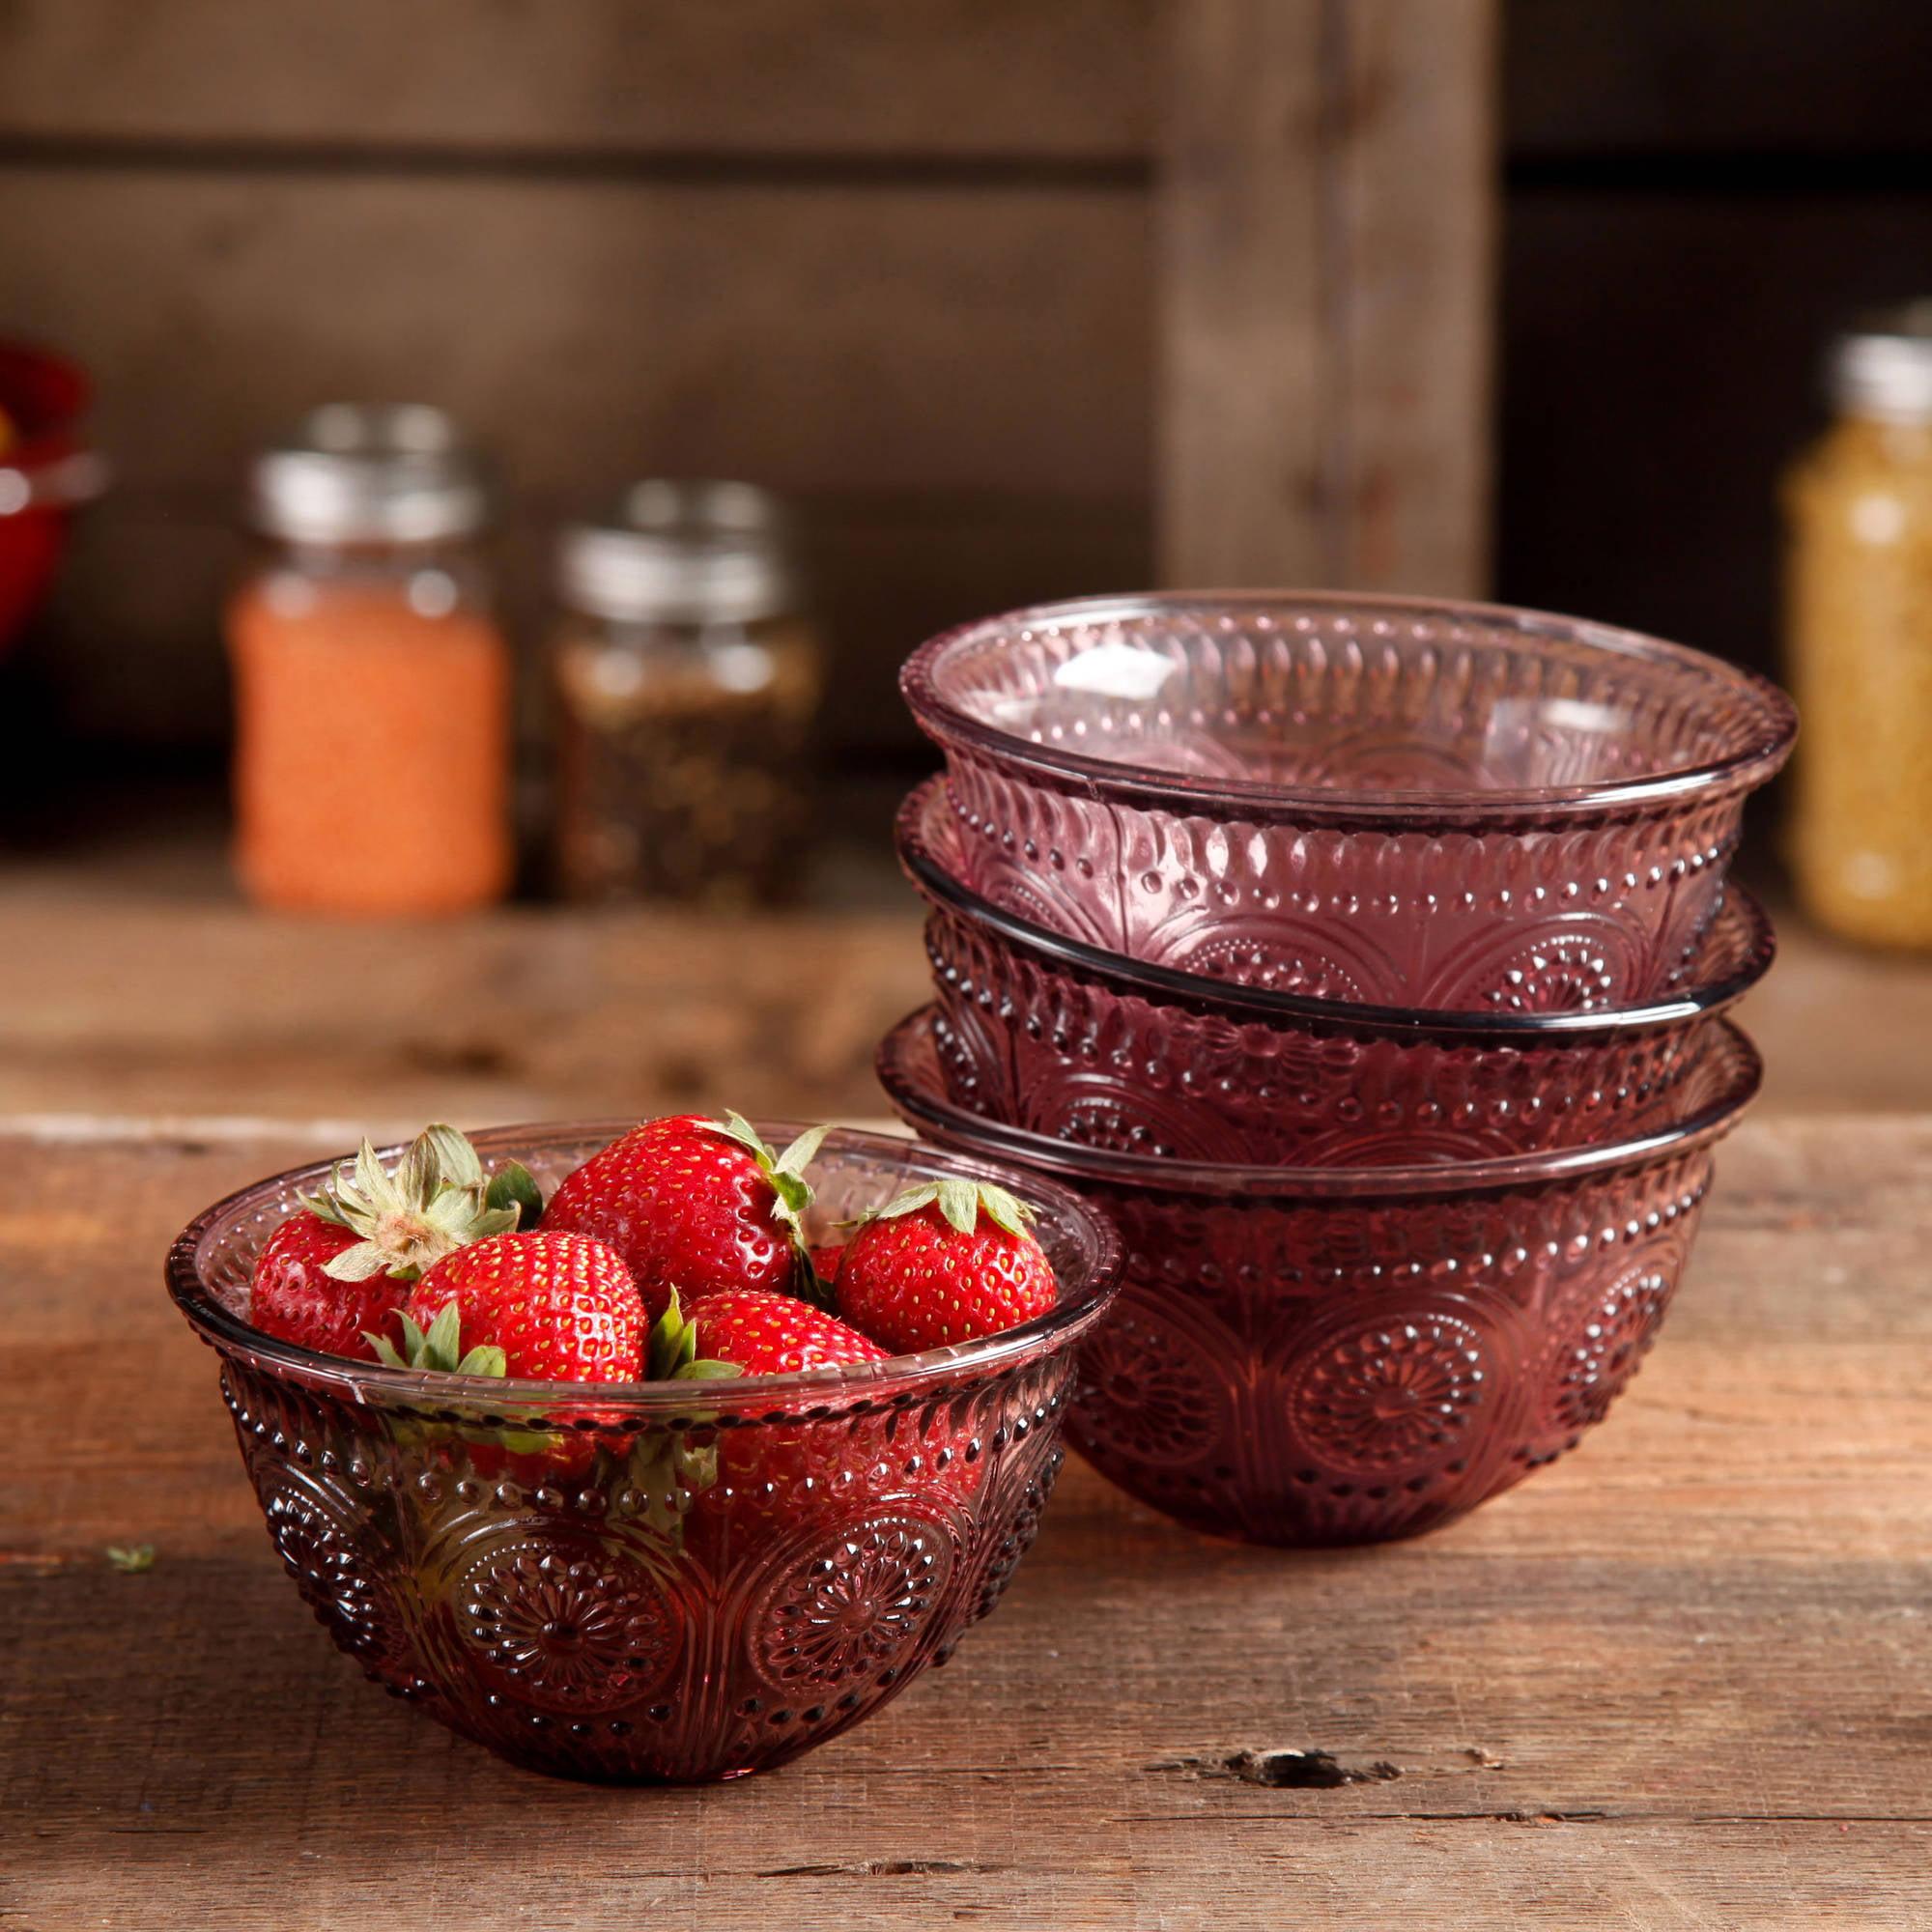 The Pioneer Woman Adeline 13 oz Emboss Glass Bowl, Set of 4